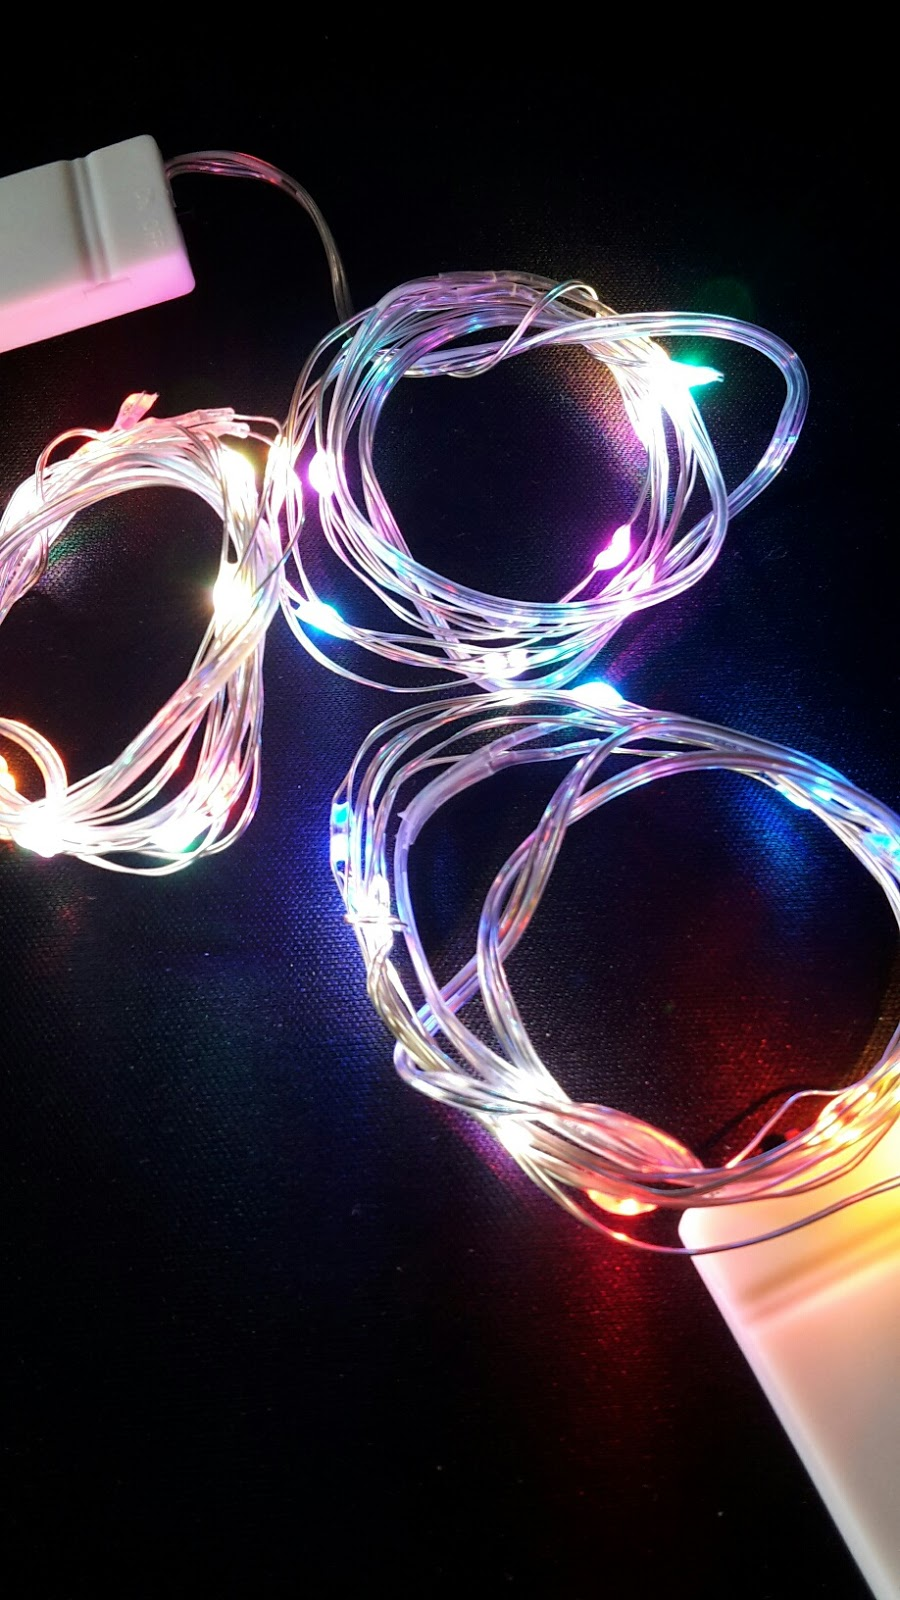 lahr2006 testet: LED Kupferdraht Lichterkette   InnooLight 3 Stück ...